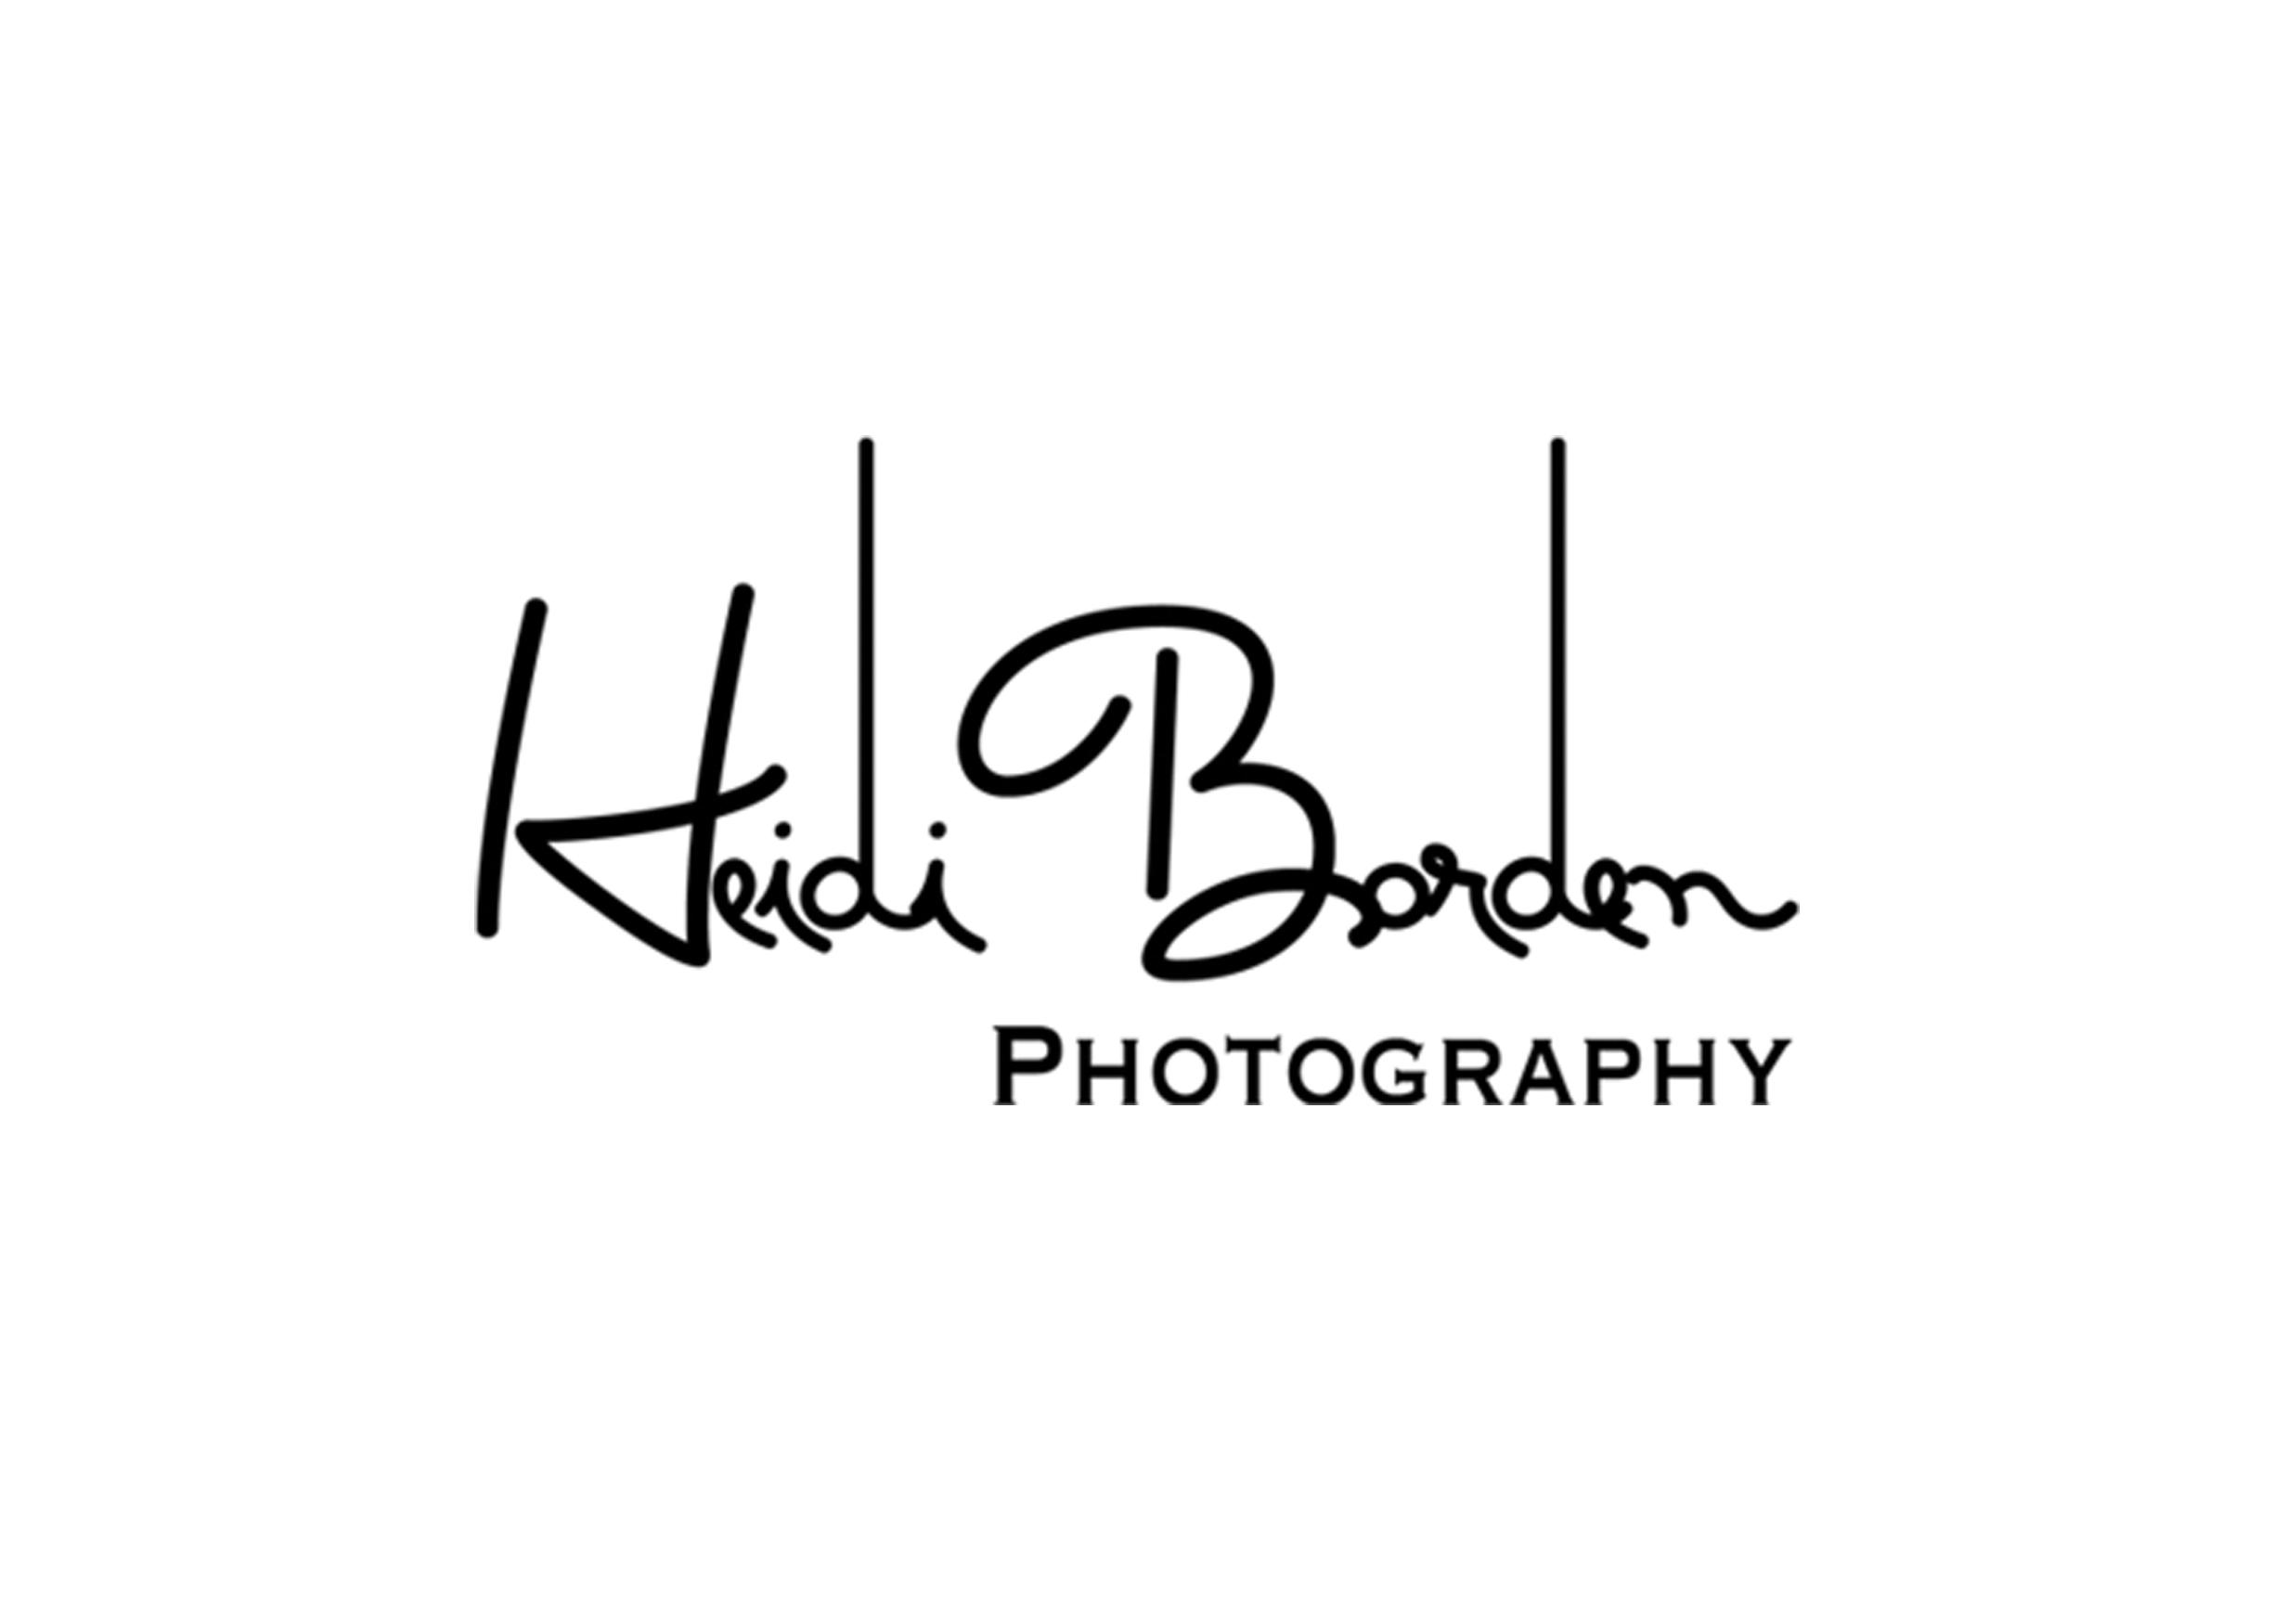 Heidi Borden Photography